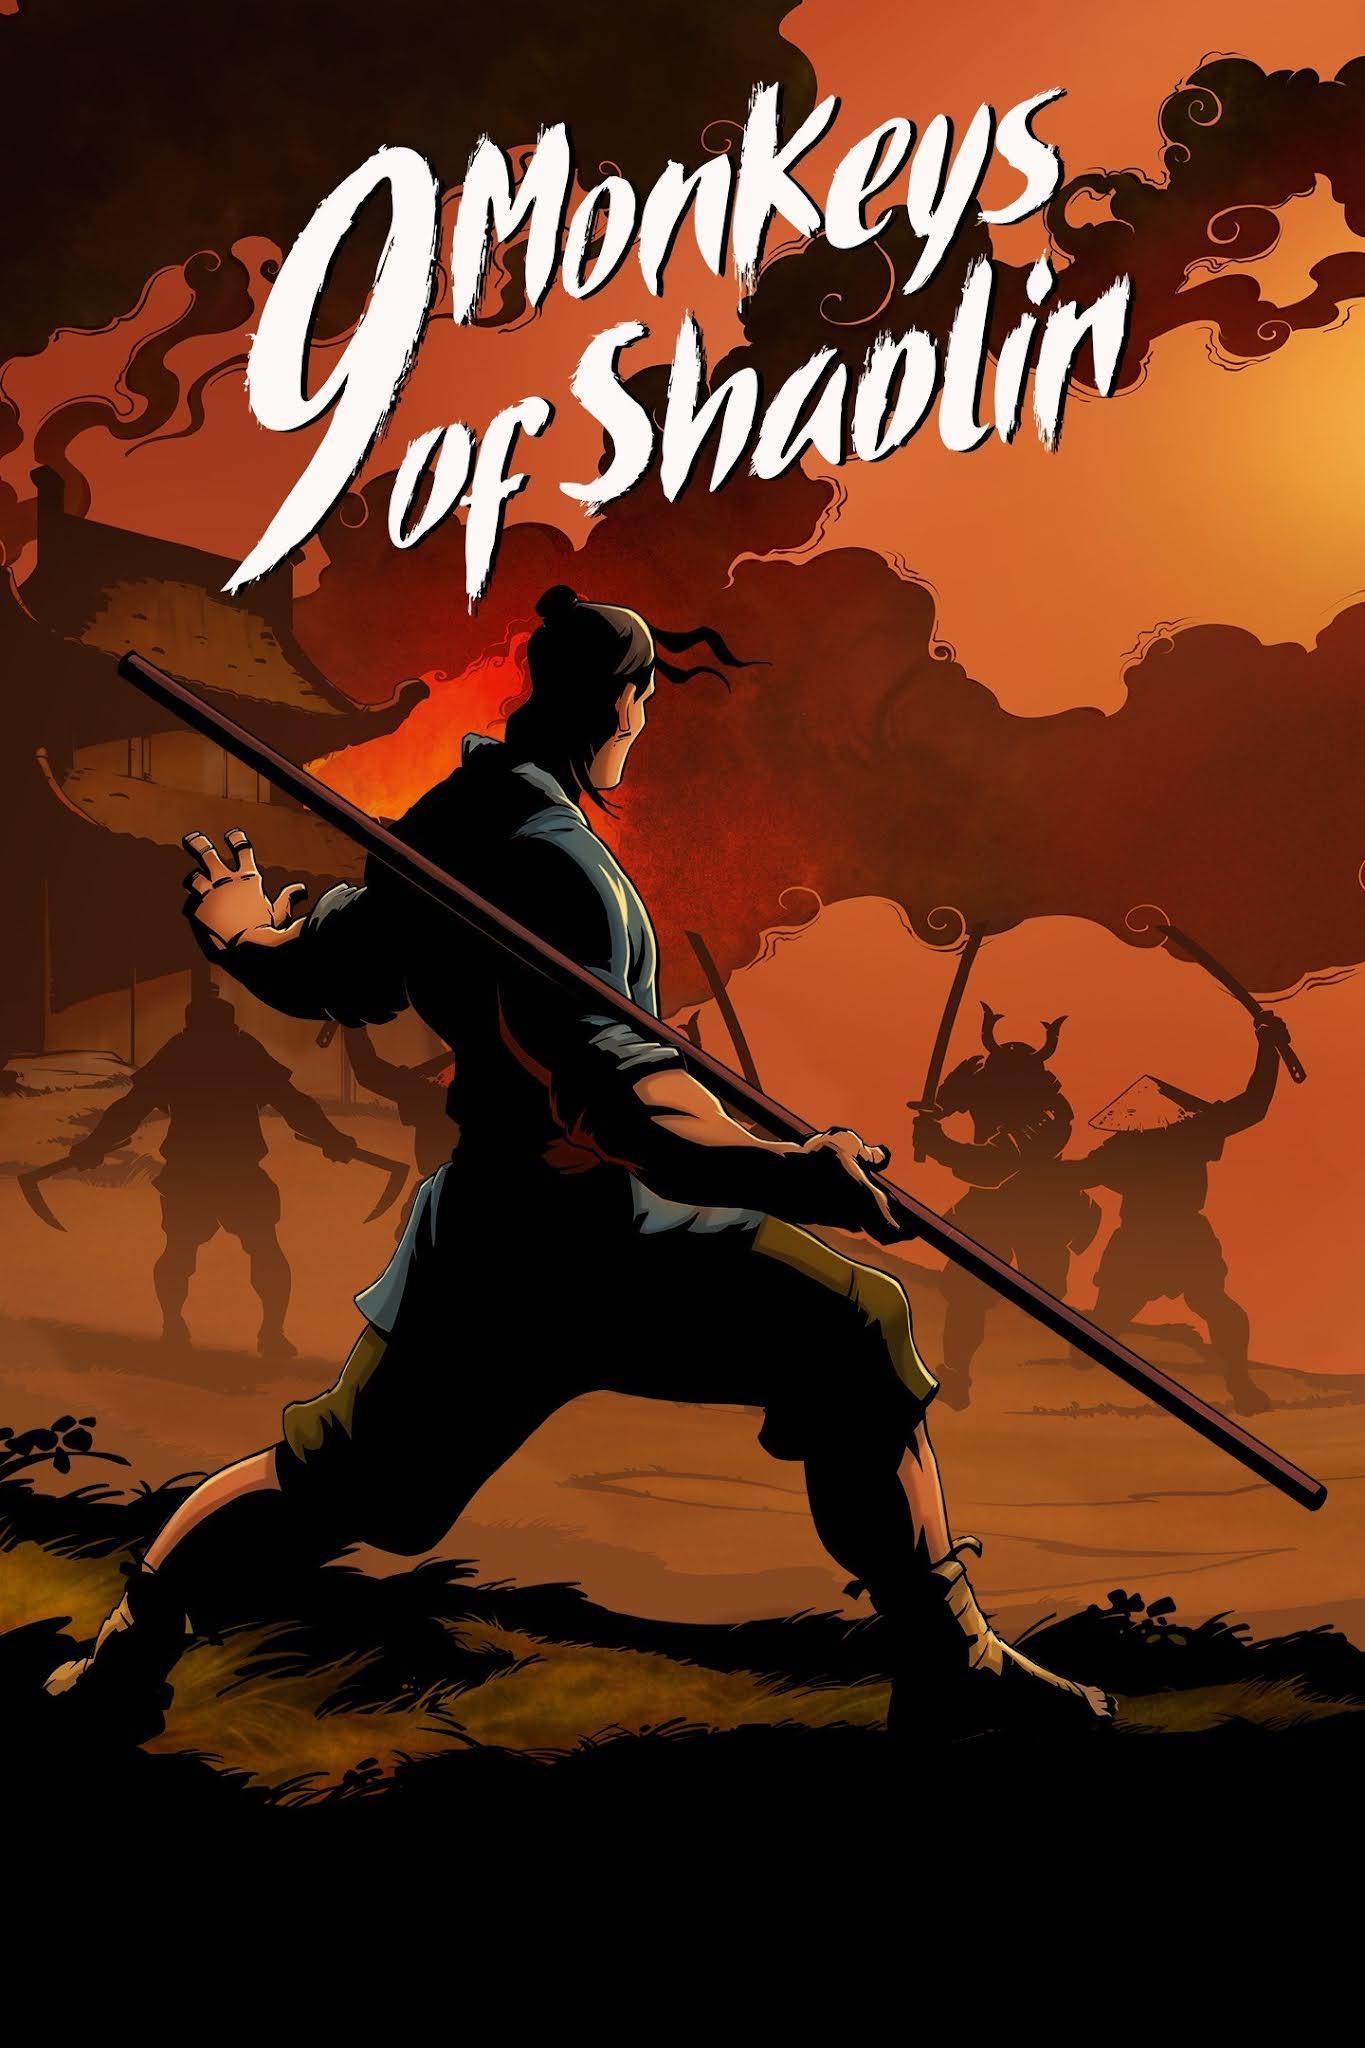 Baixar 9 Monkeys of Shaolin Torrent (PC)